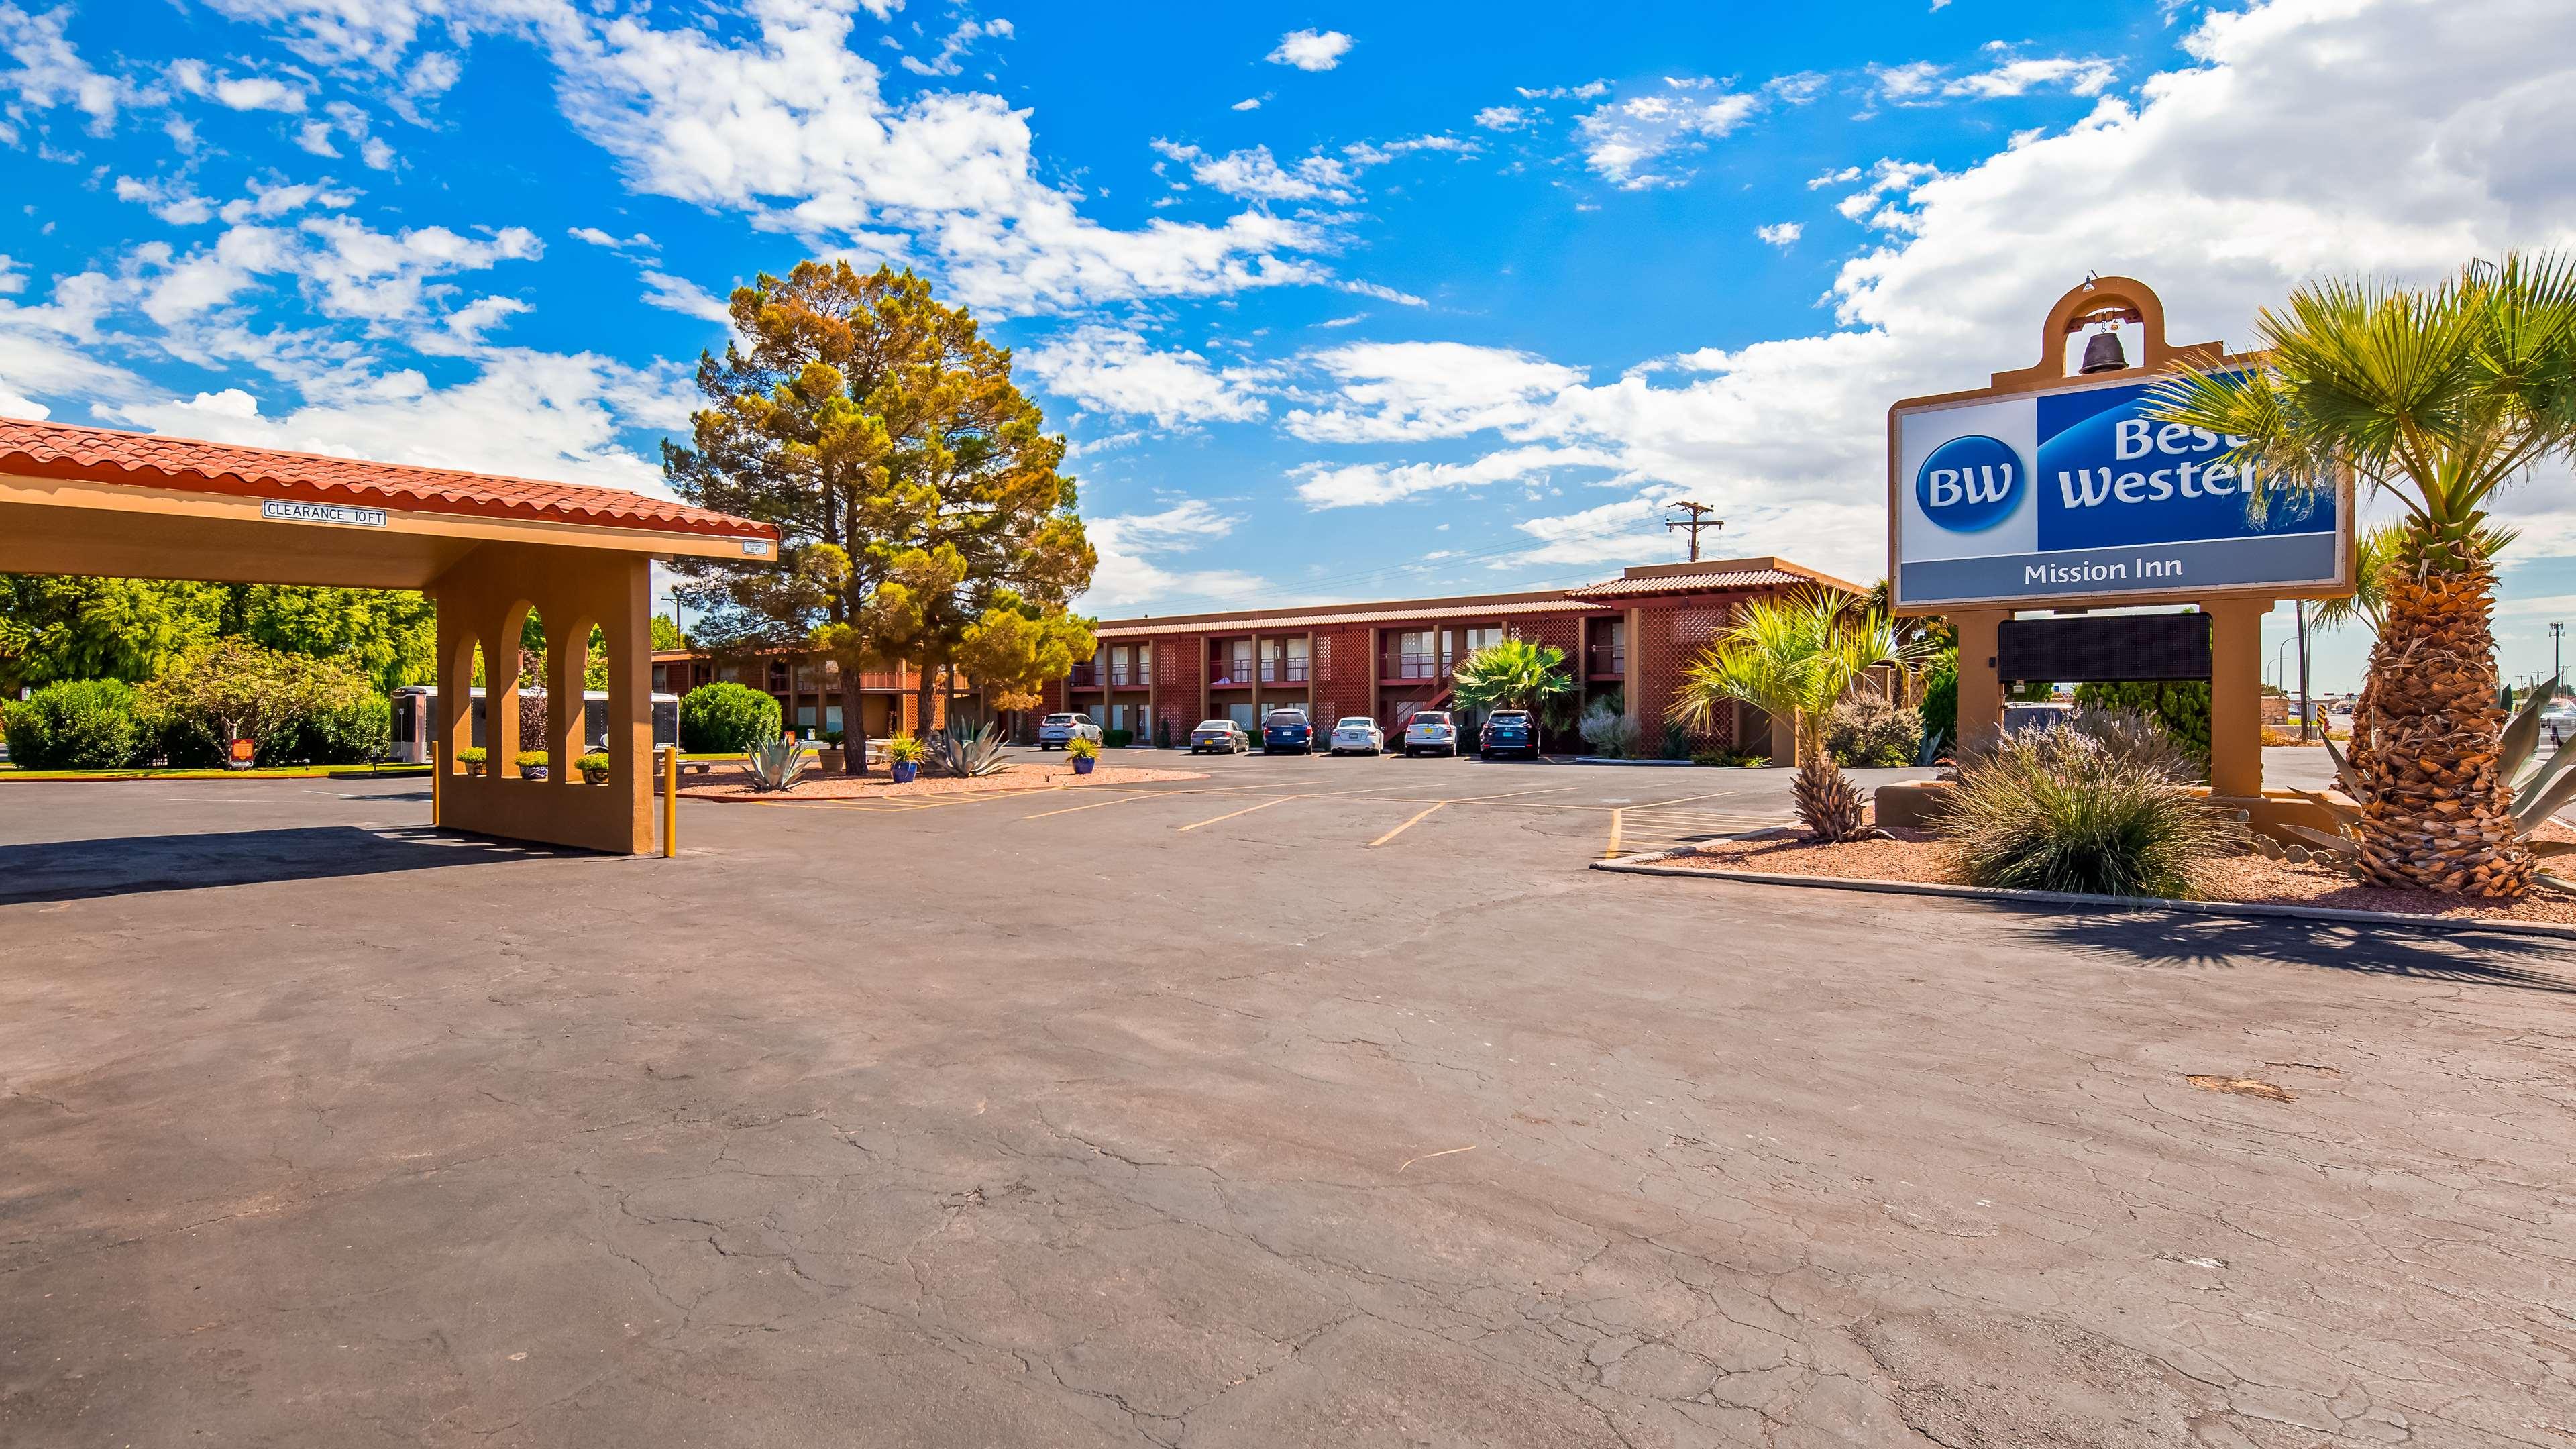 Best Western Mission Inn image 1